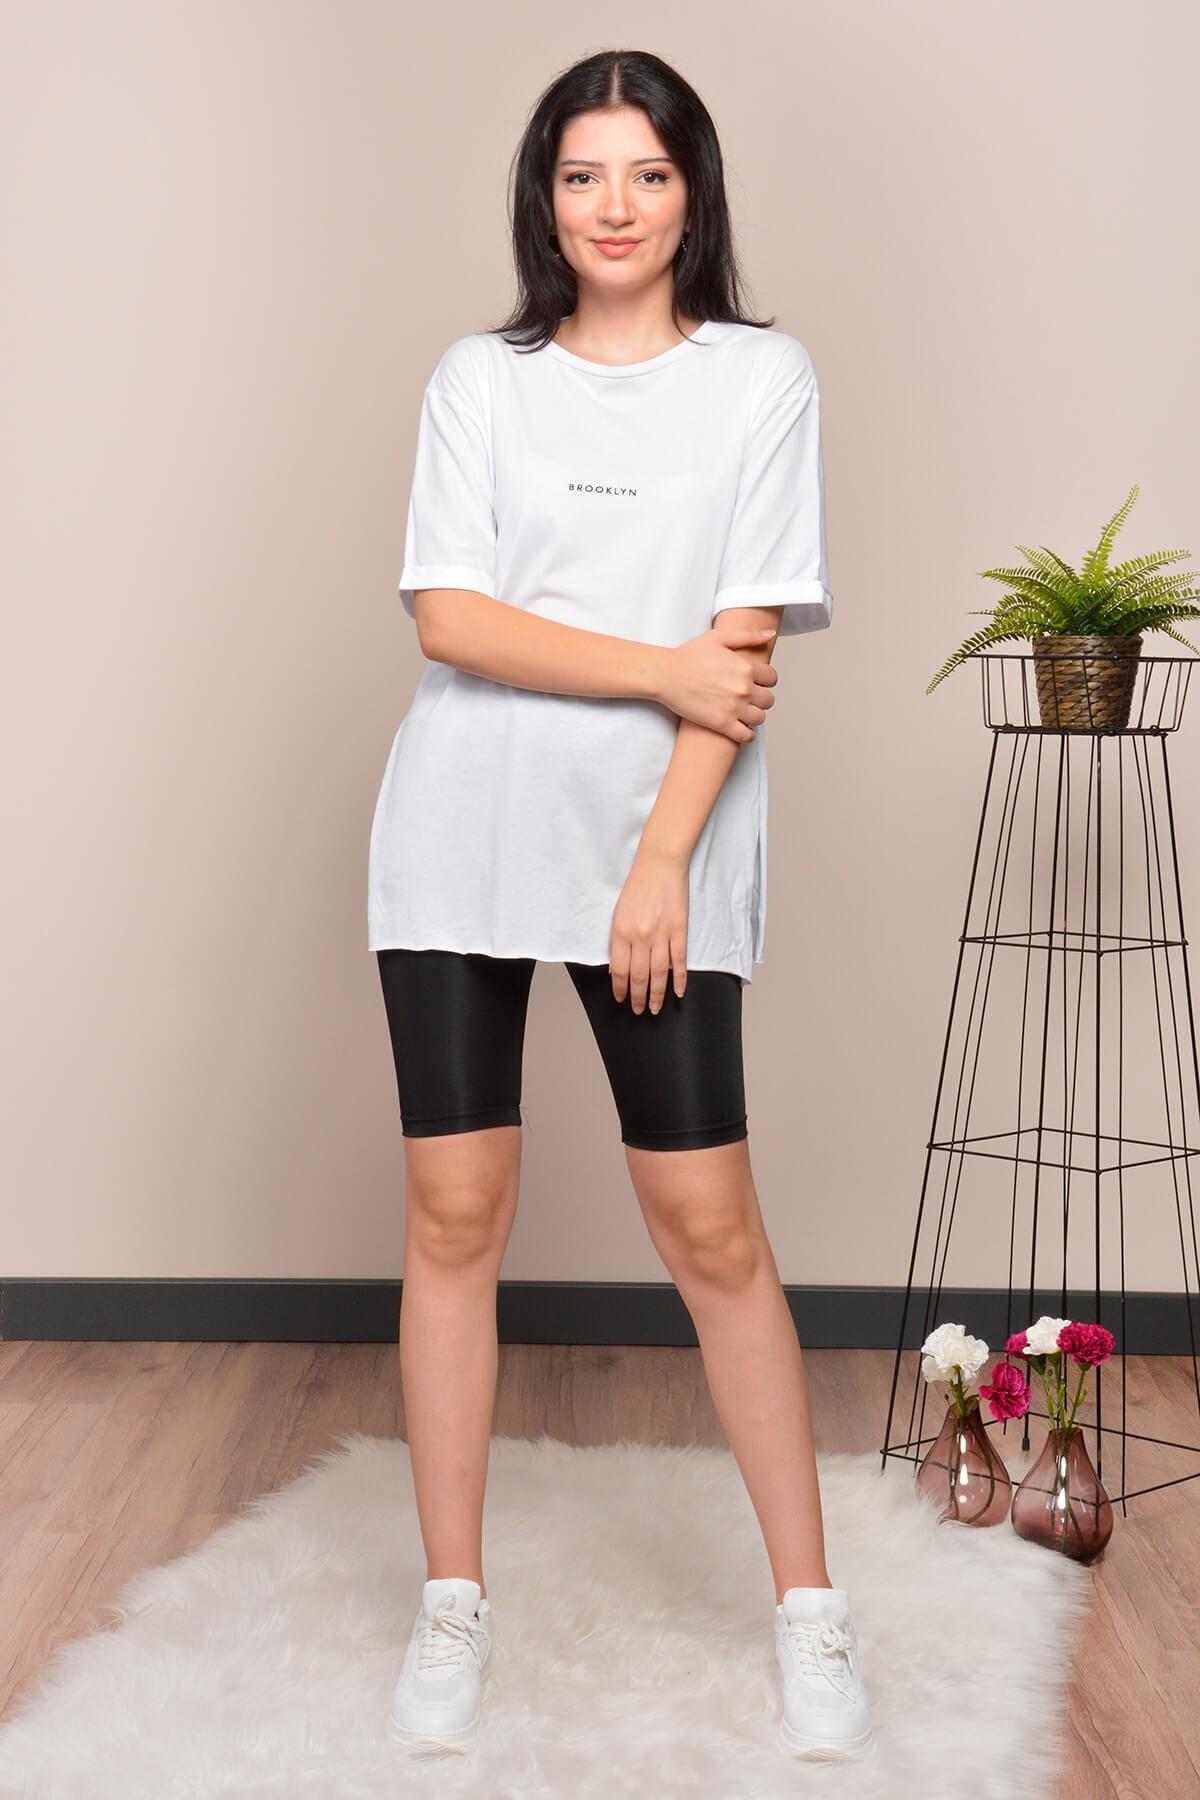 Mossta Kadın Beyaz Yırtmaçlı Lazer Kesim T-shirt 1